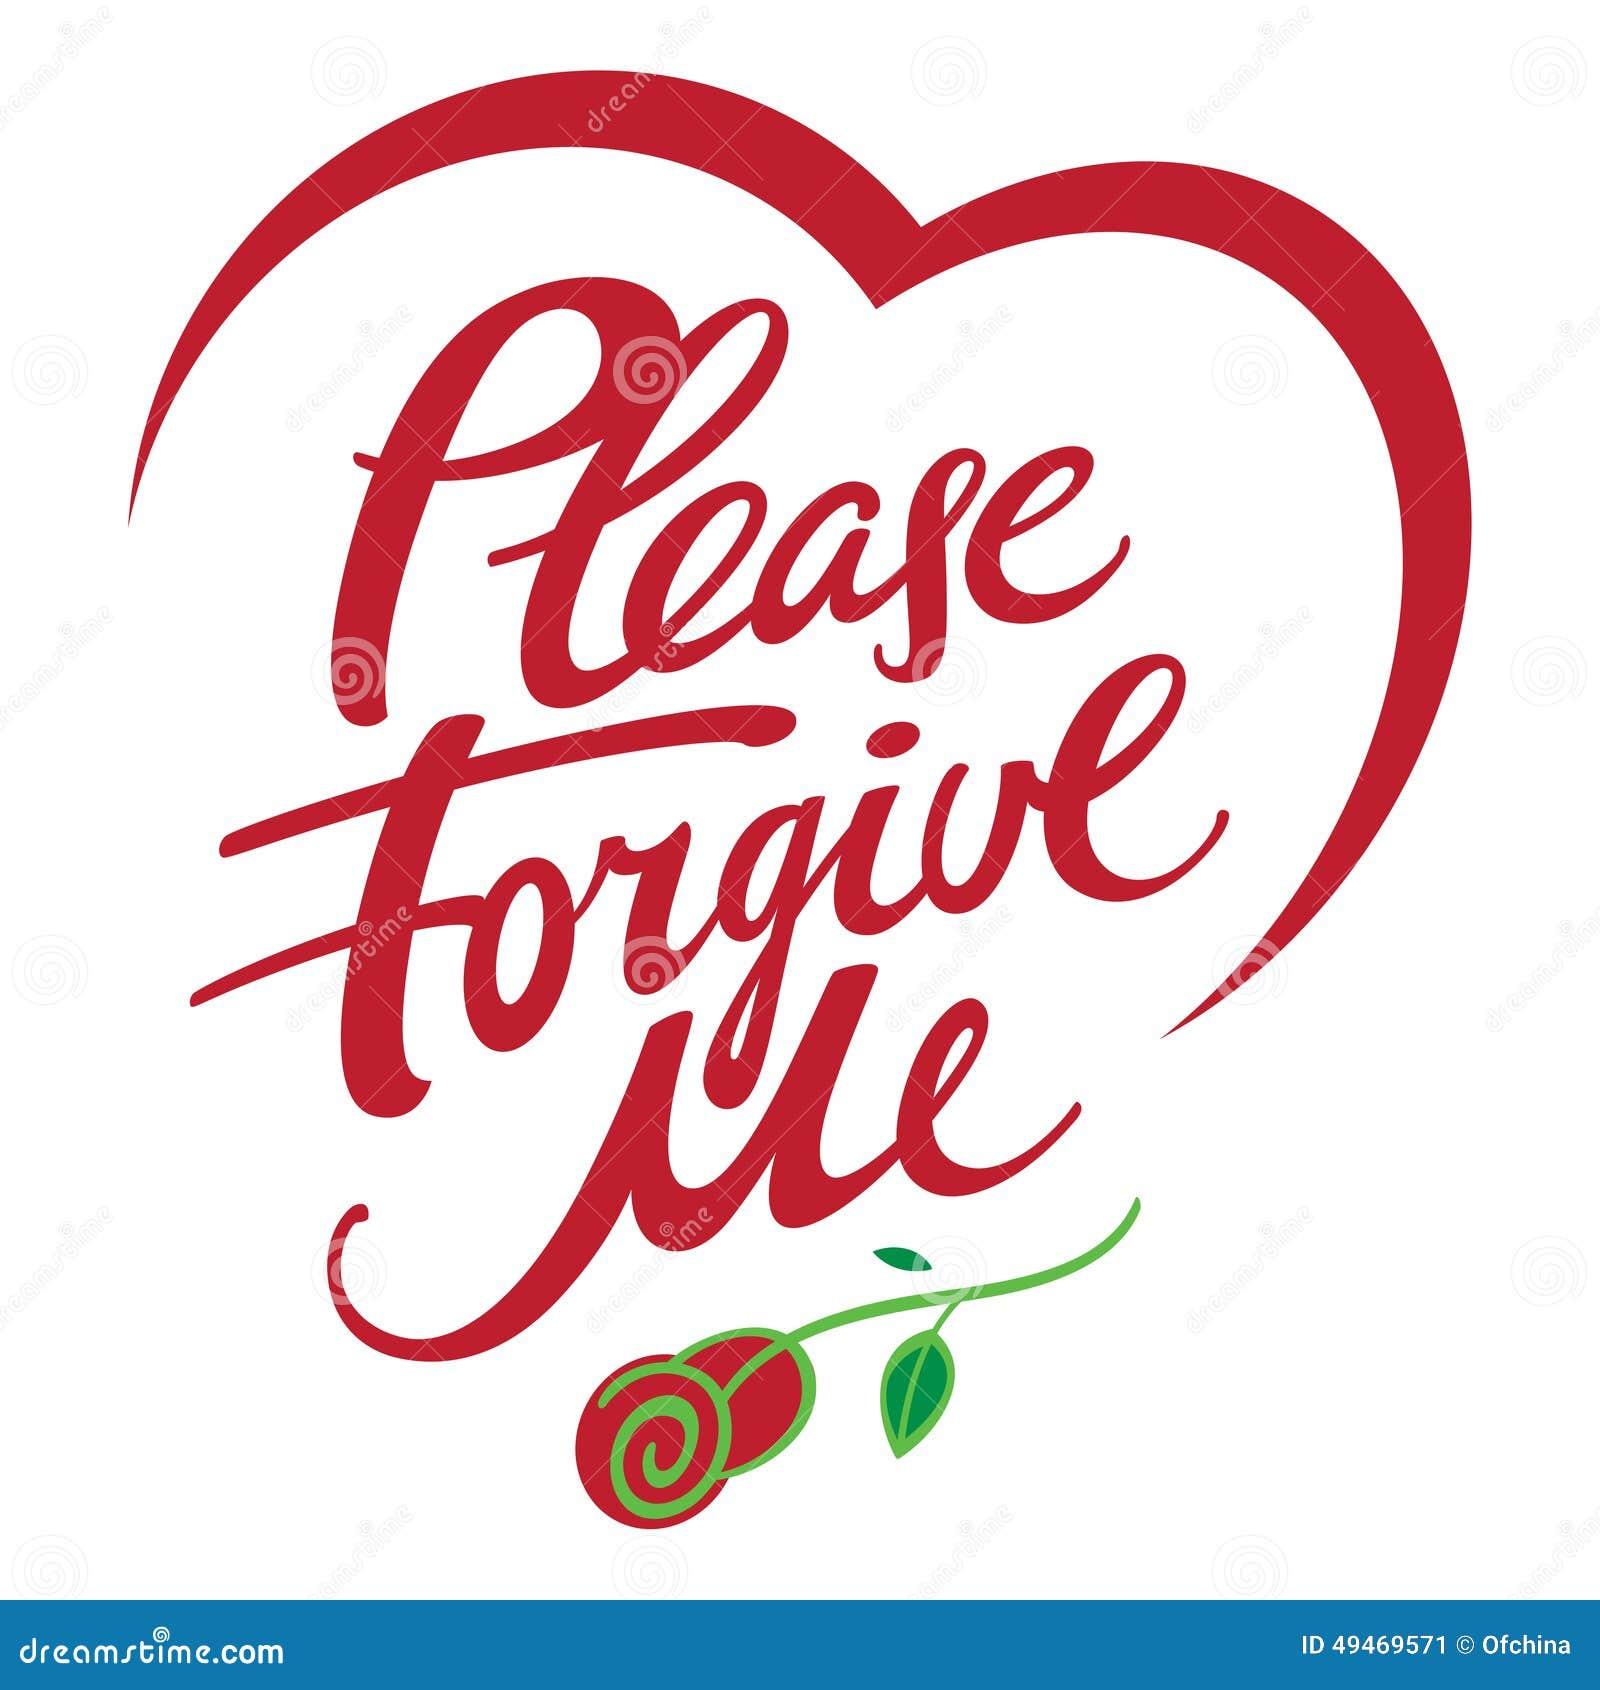 Rose Me Please